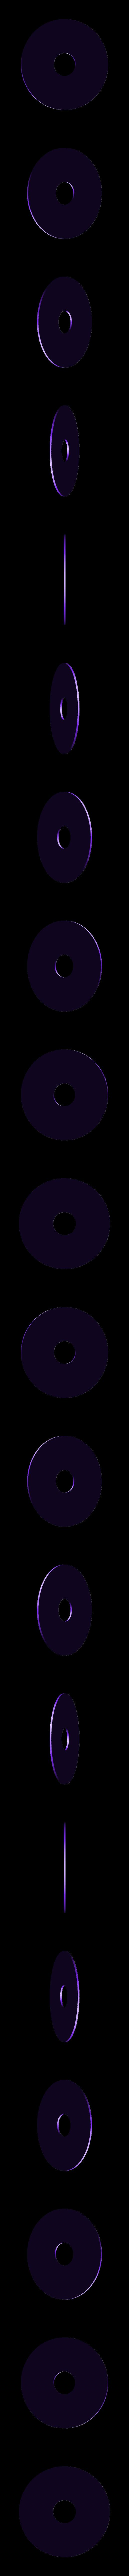 washer_32x0.6mm.stl Download free STL file PISTOL VR magnetic gunstock Oculus Rift-S Quest • 3D printer template, danielschweinert